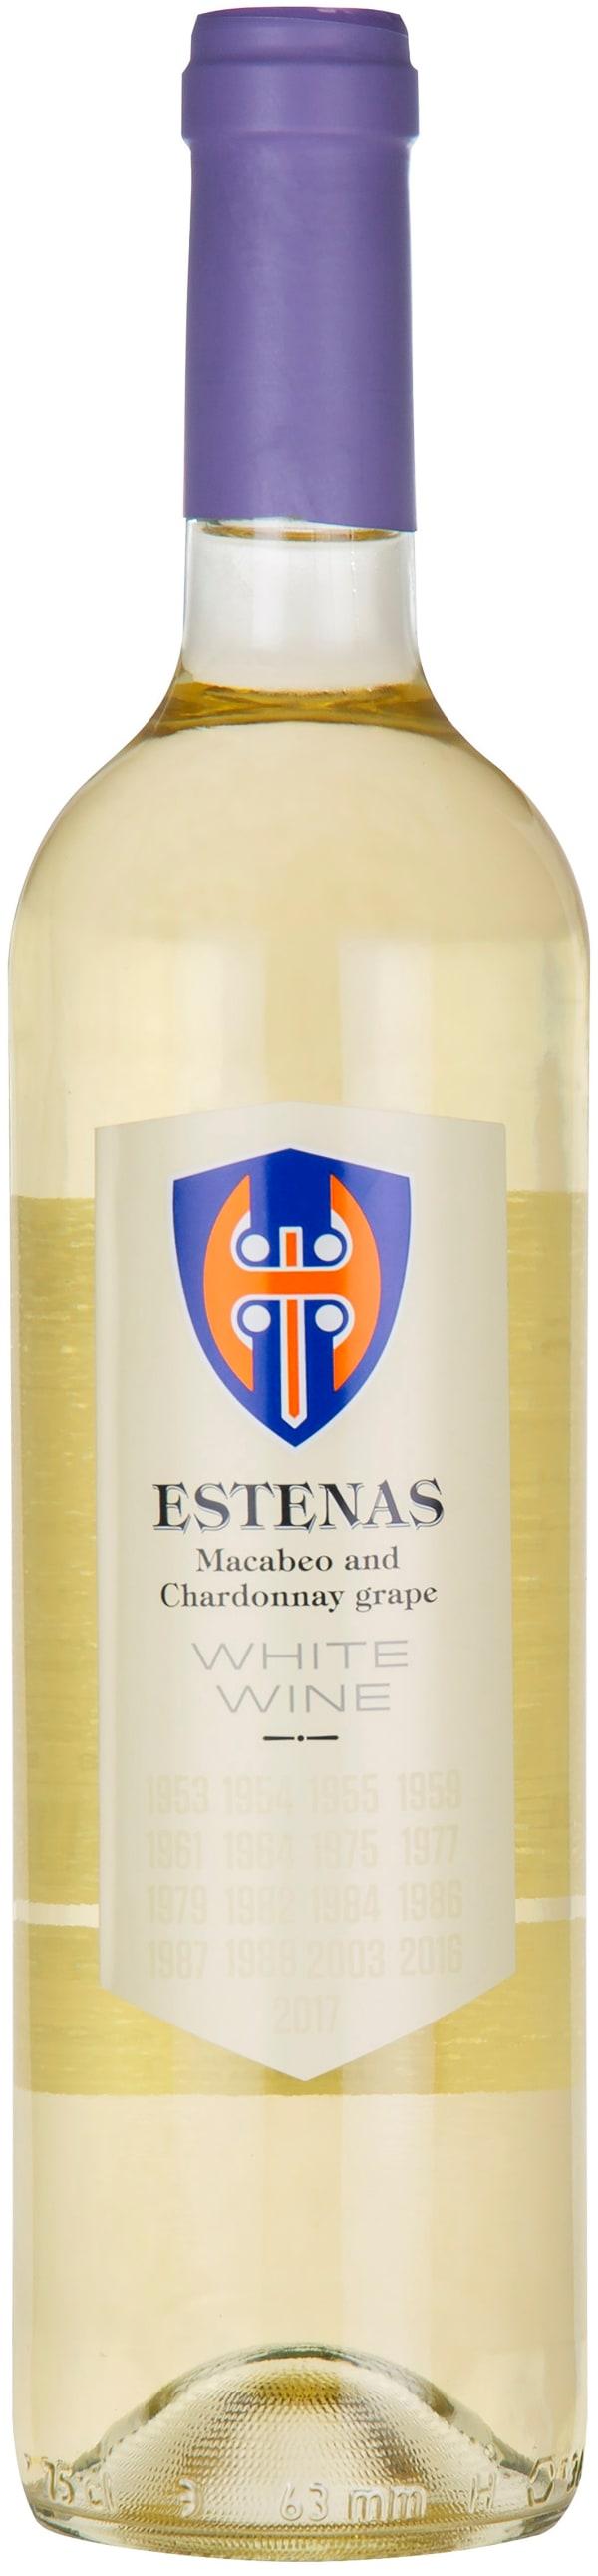 Tappara Estenas Blanco 2019